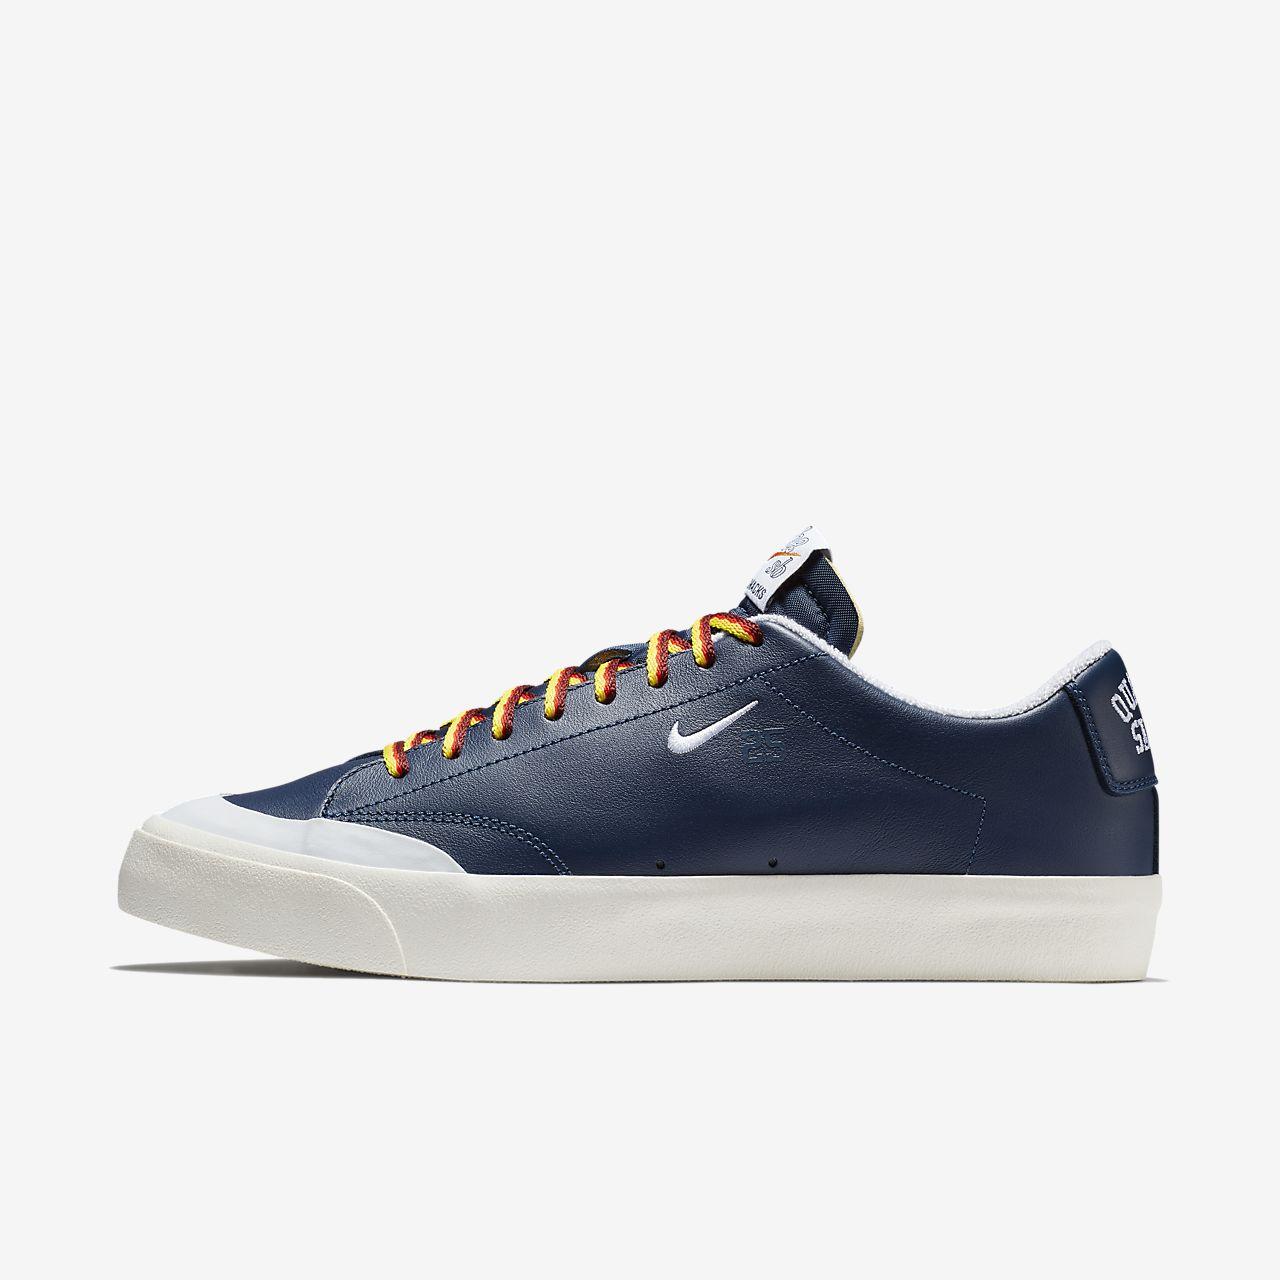 separation shoes 8cca9 69920 ... Nike SB Zoom Blazer Low XT QS Zapatillas de skateboard - Hombre